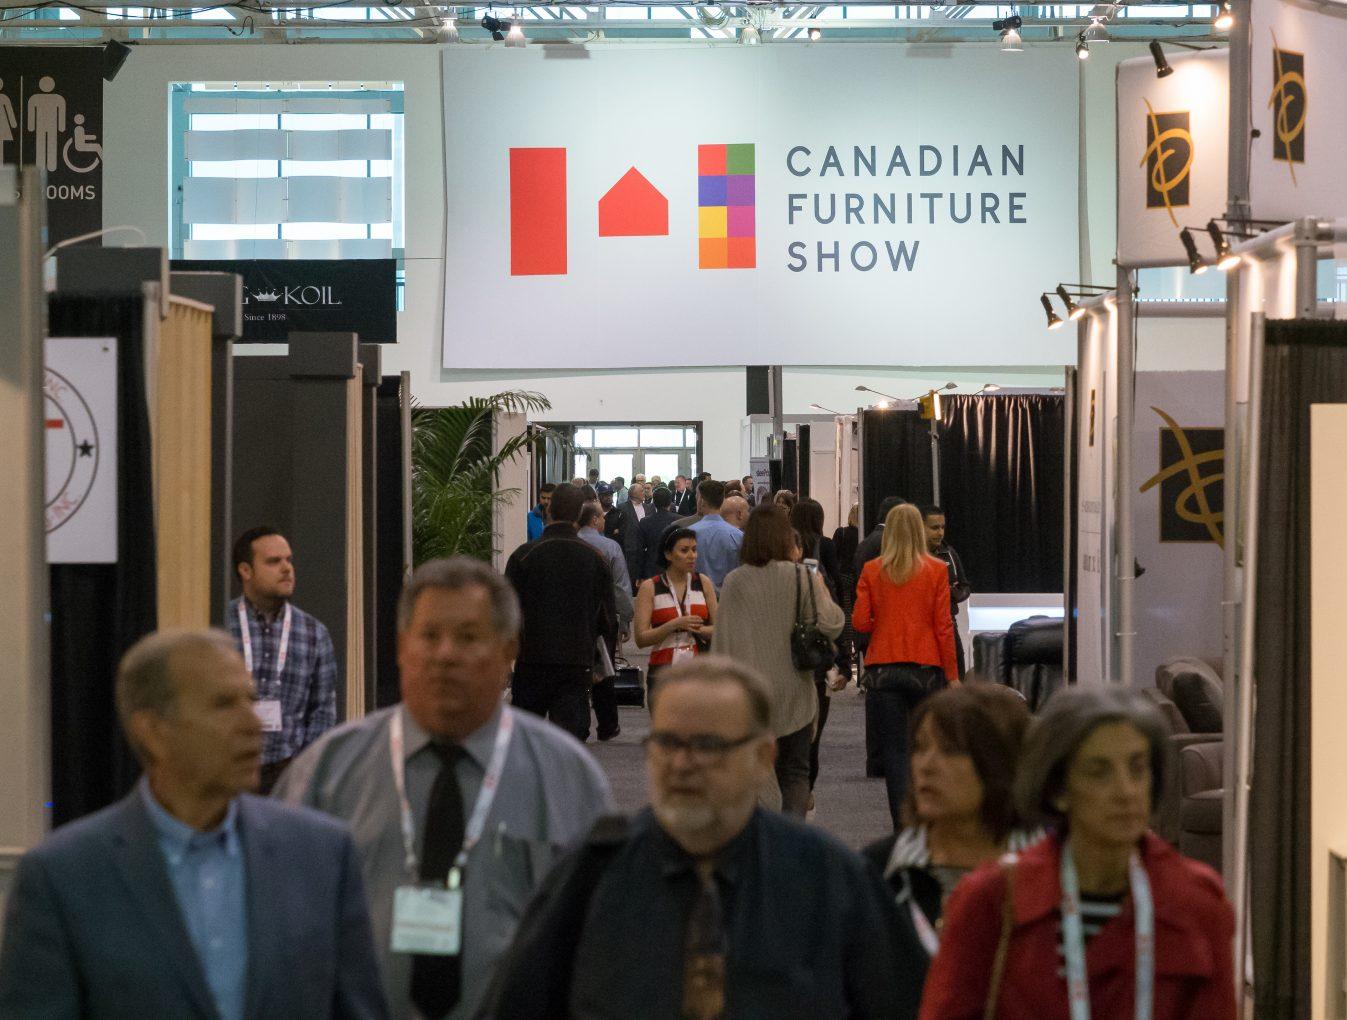 Canadian Furniture Show 2019